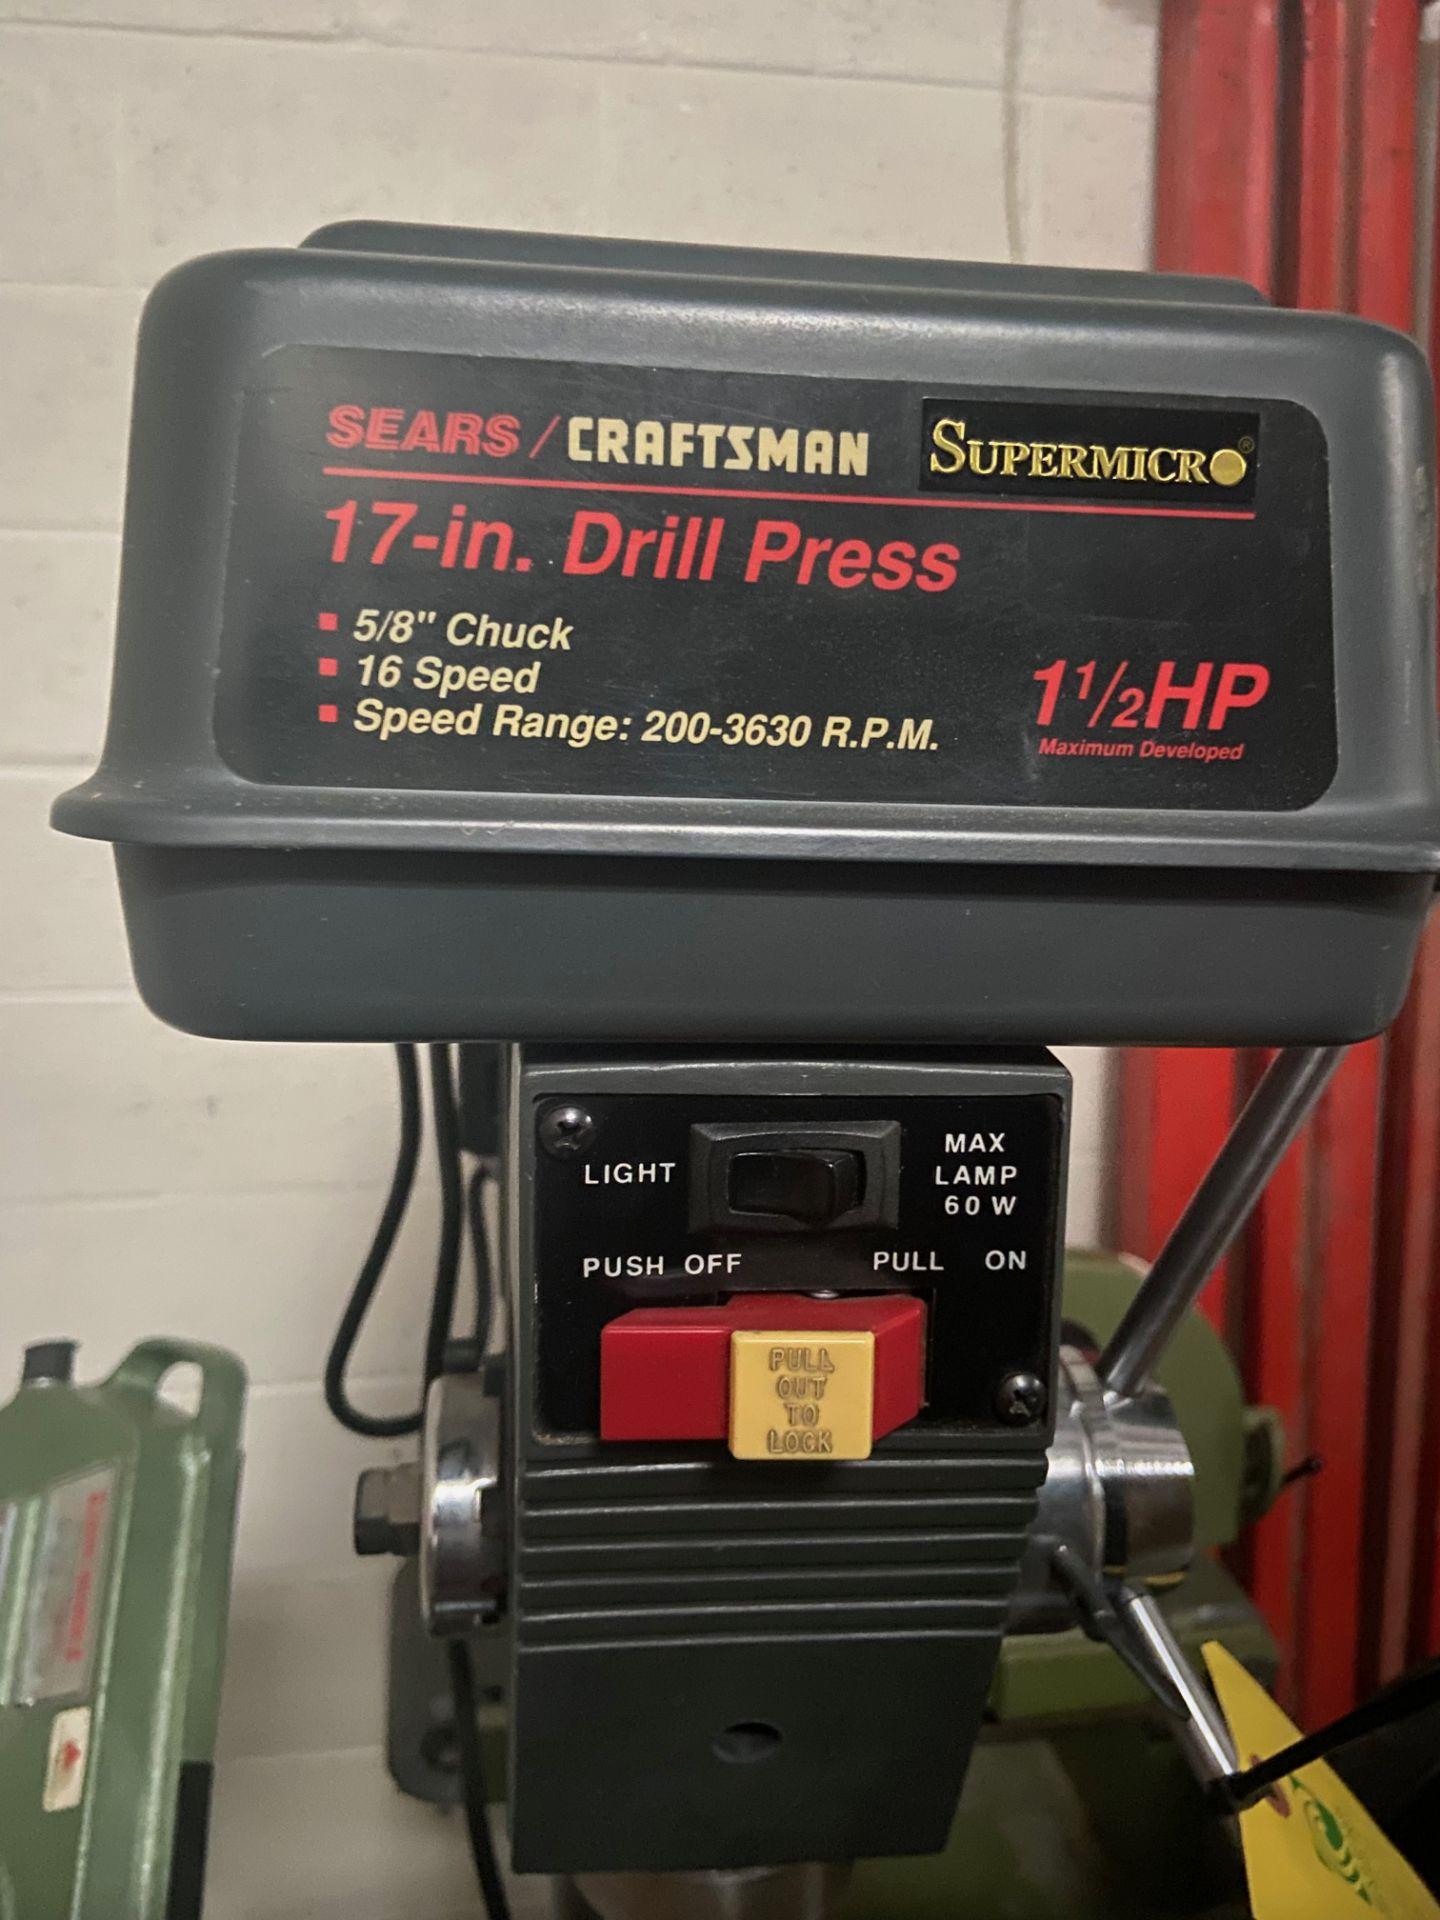 "Sears/Craftsman 17"" Drill Press, 5/8"" Chuck, 200-3630 RPM, Model# 113.213171, Serial# 961870038, - Image 3 of 6"